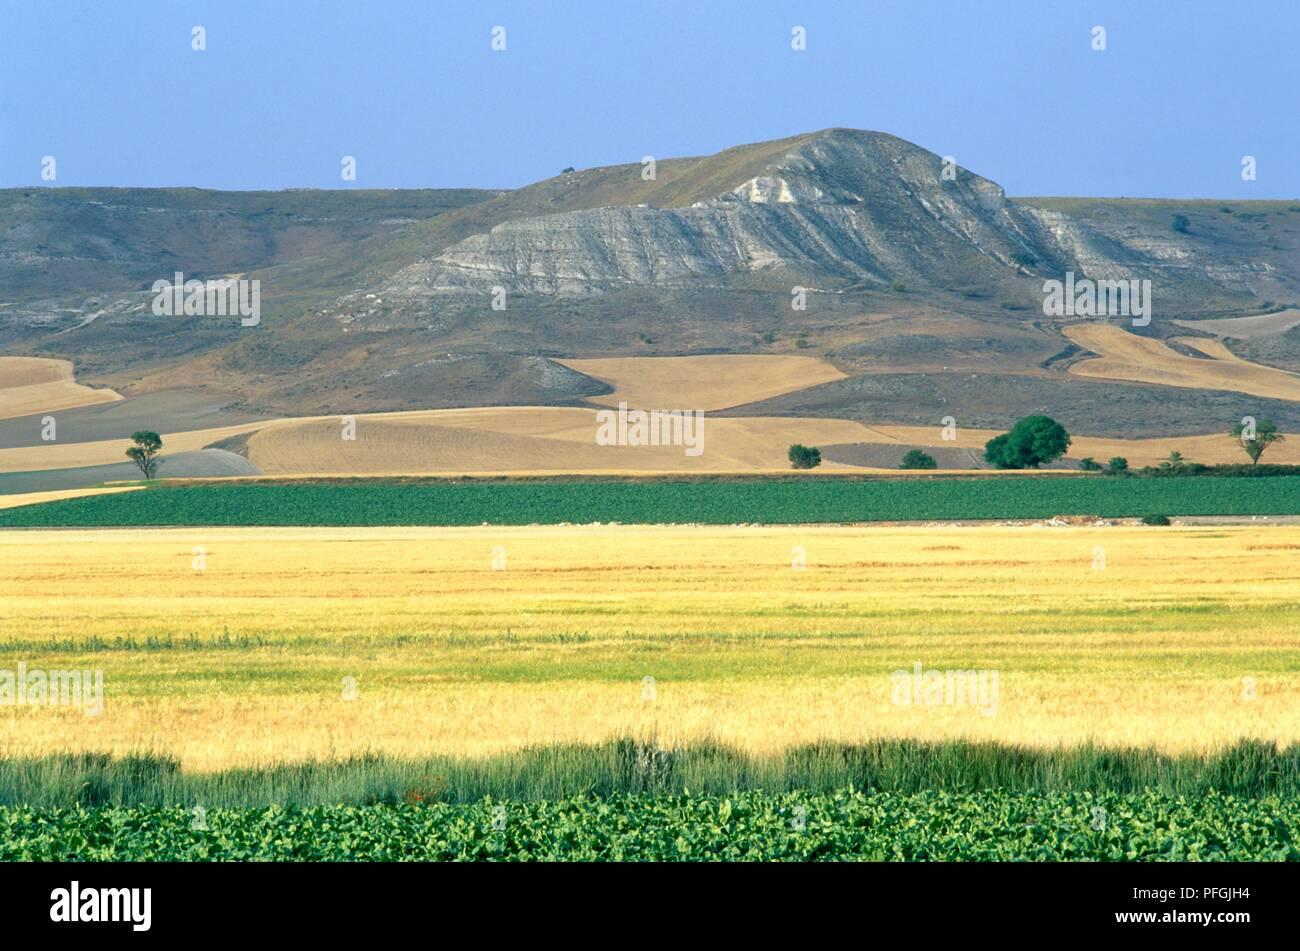 Spain, Castilla y Leon, Palencia Province, Tierra de Campos, fields backed by hills - Stock Image